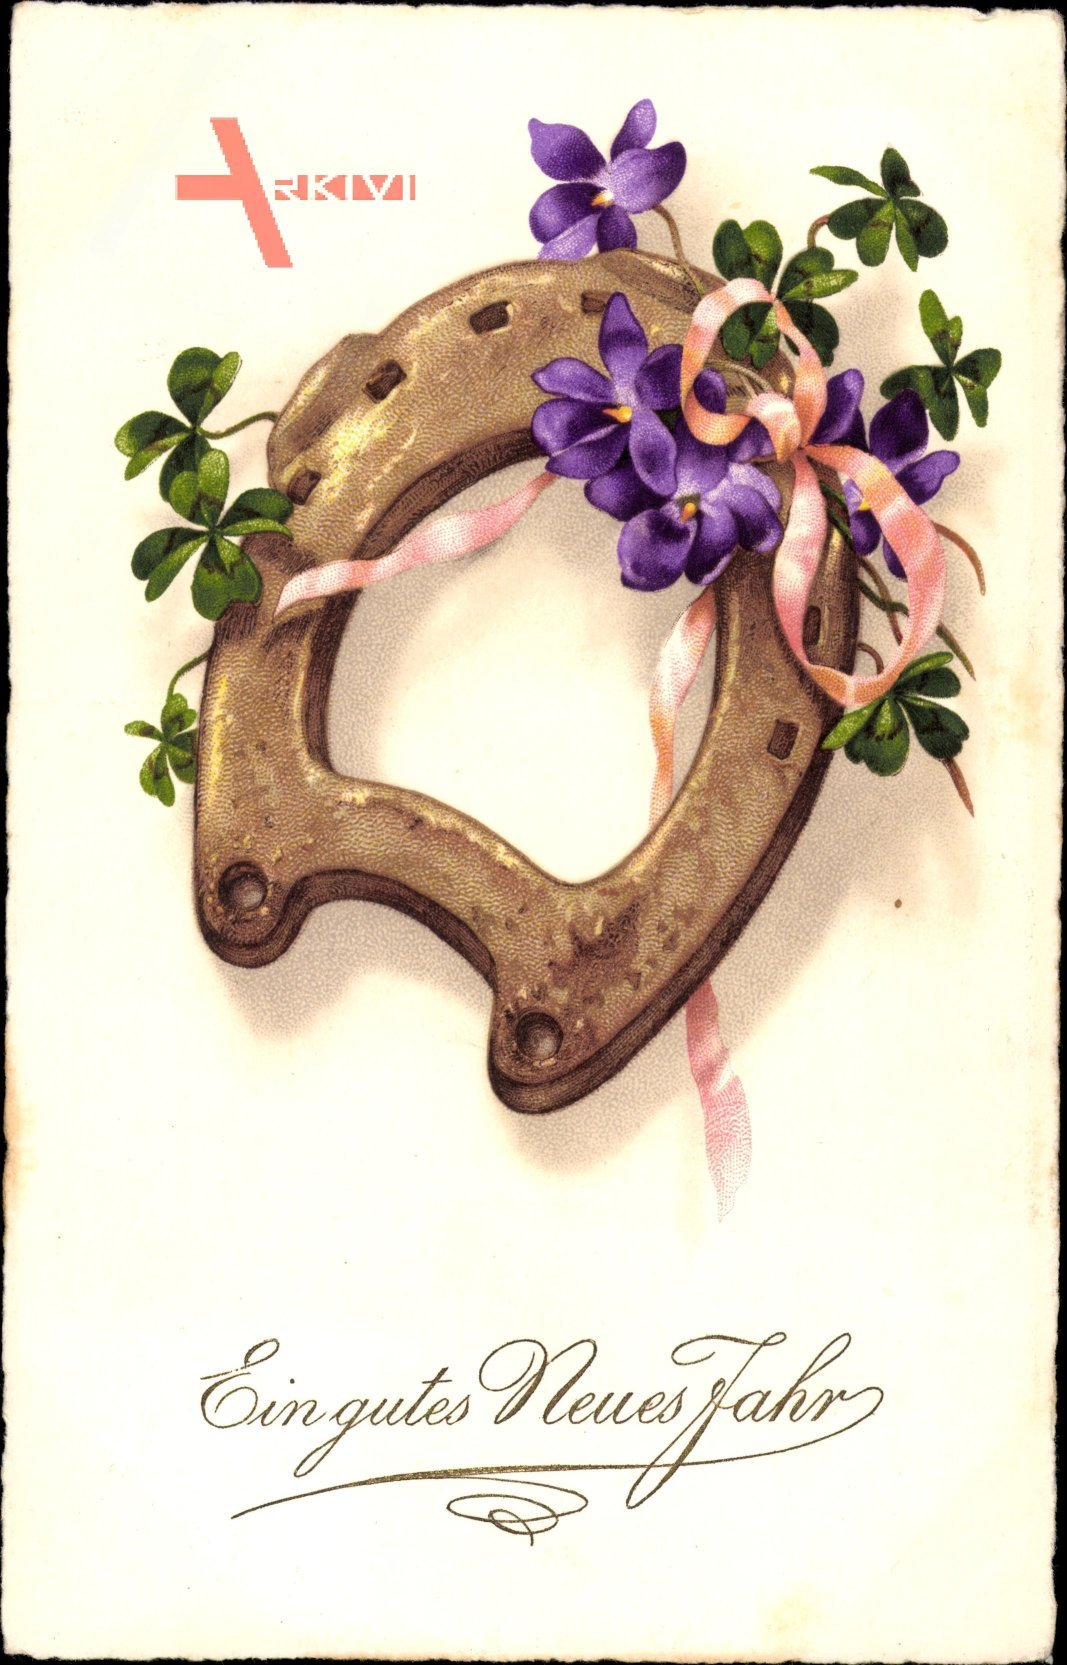 Glückwunsch Neujahr, Hufeisen, Kleeblätter, lila Blüten